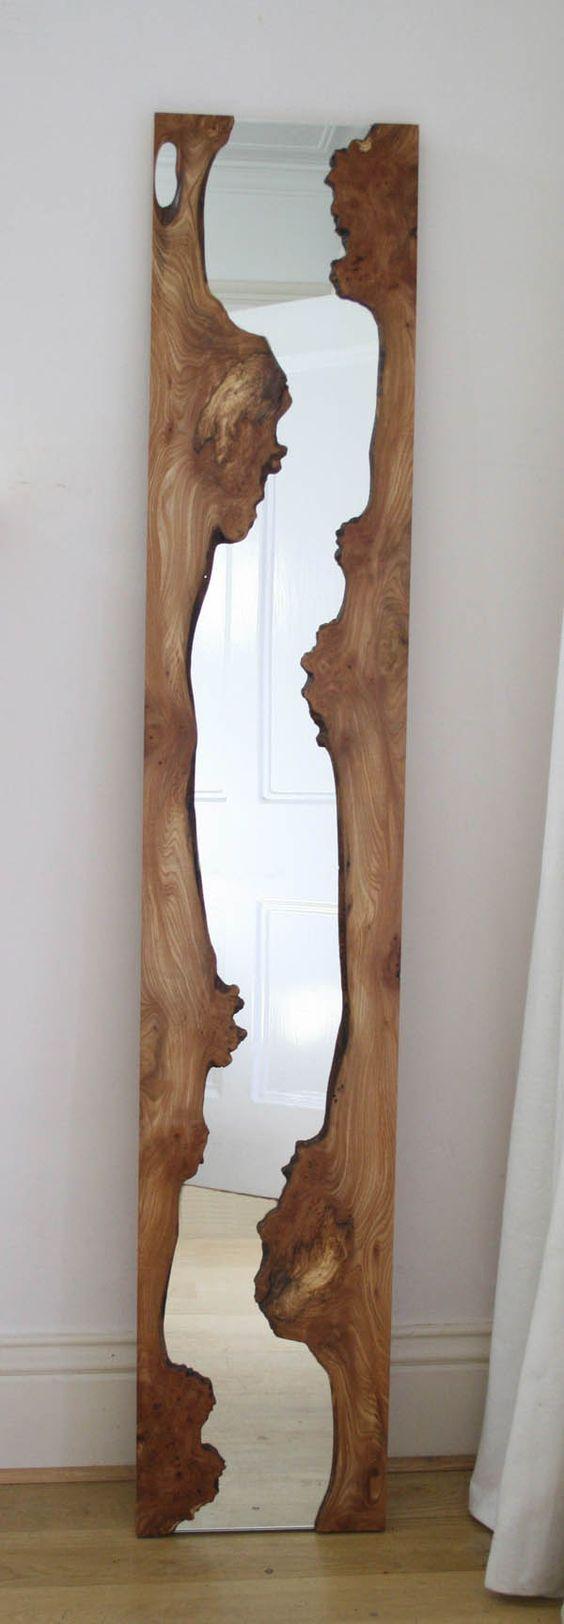 wood mirror.